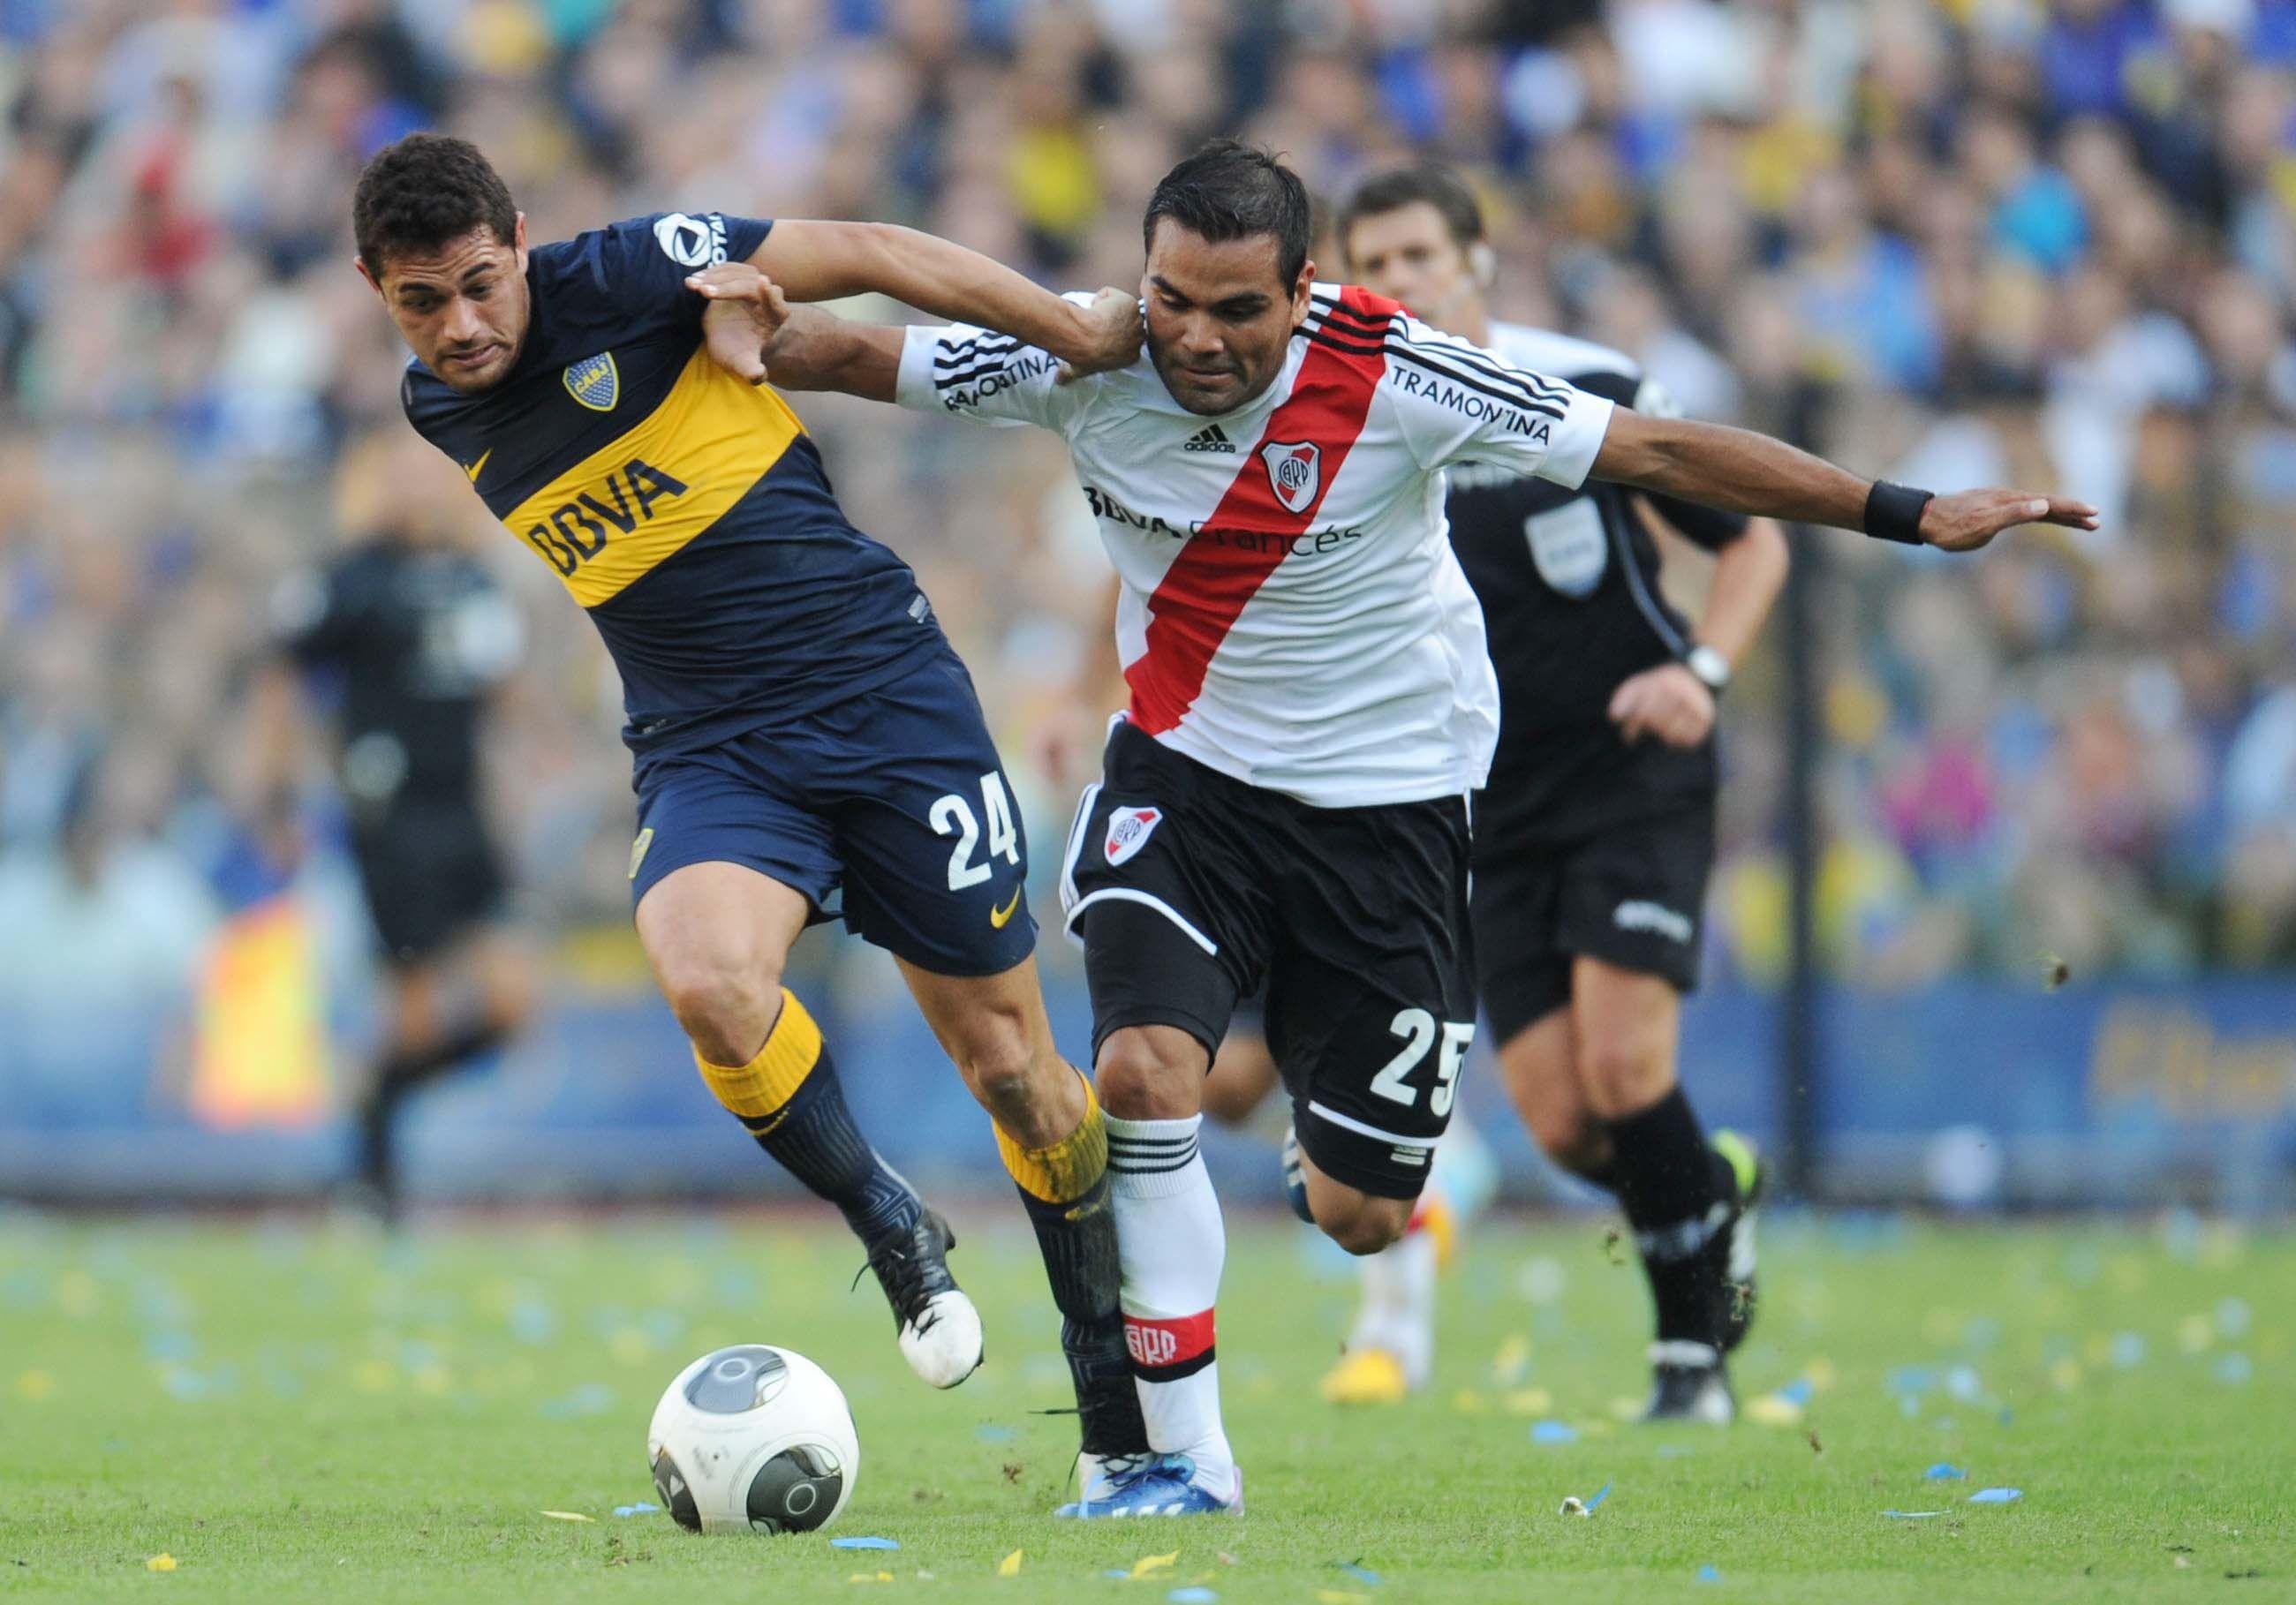 Salió El Fixture: Boca-River En La 10º Y El Rojo Debuta